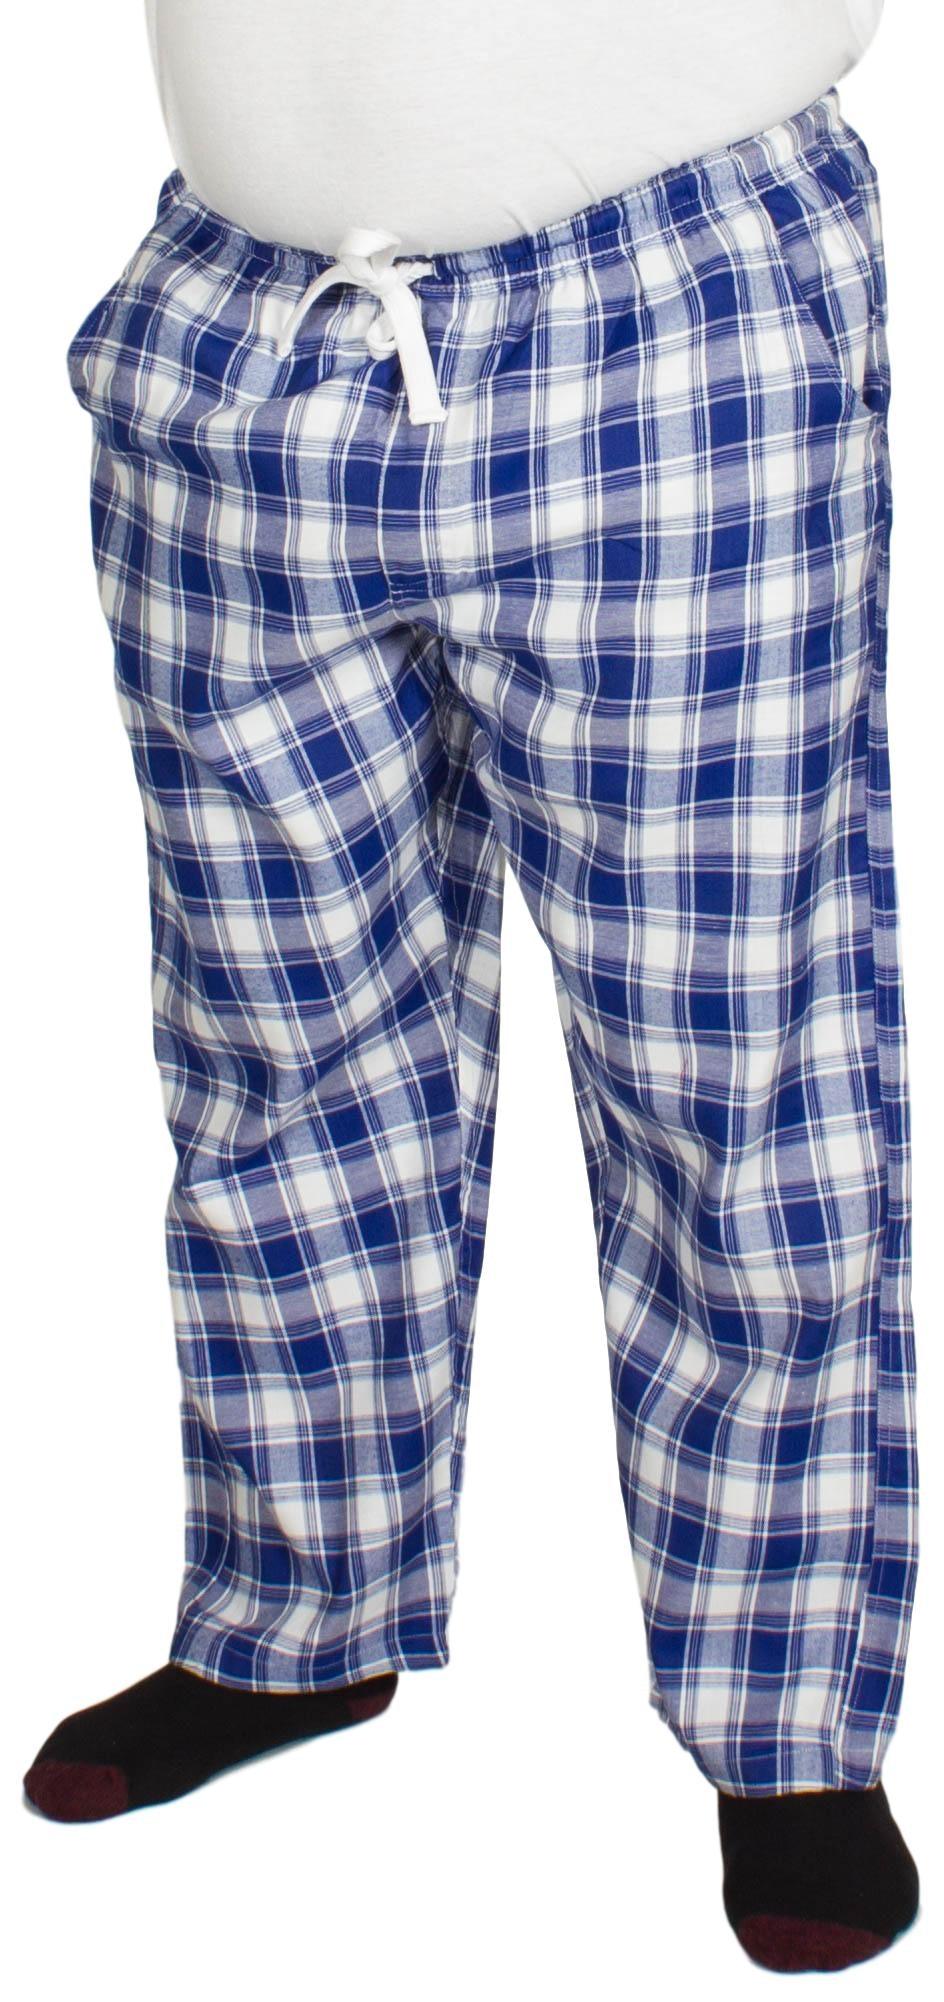 Bigdude Check Lounge Pants Blue/White